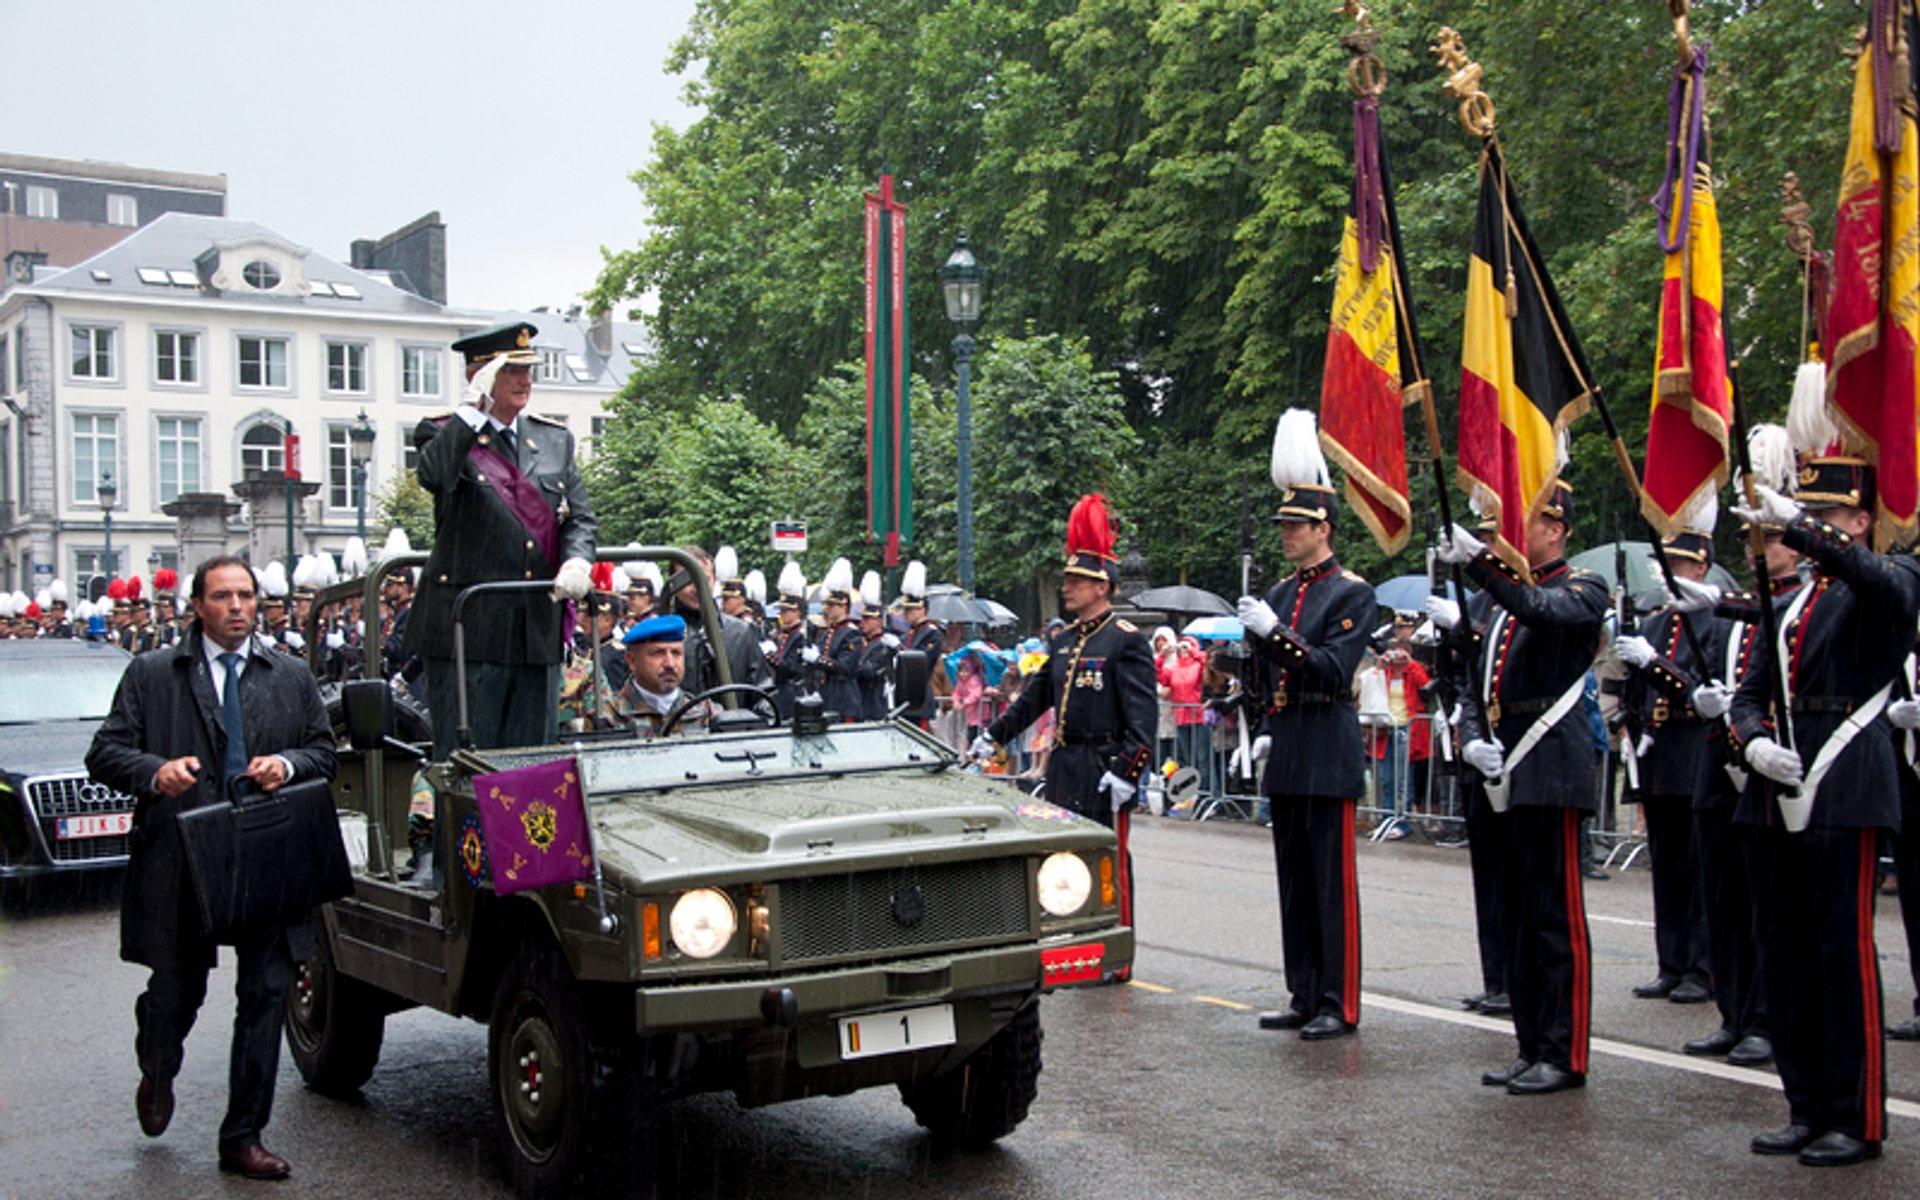 Belgian National Day in Belgium 2020 - Best Time